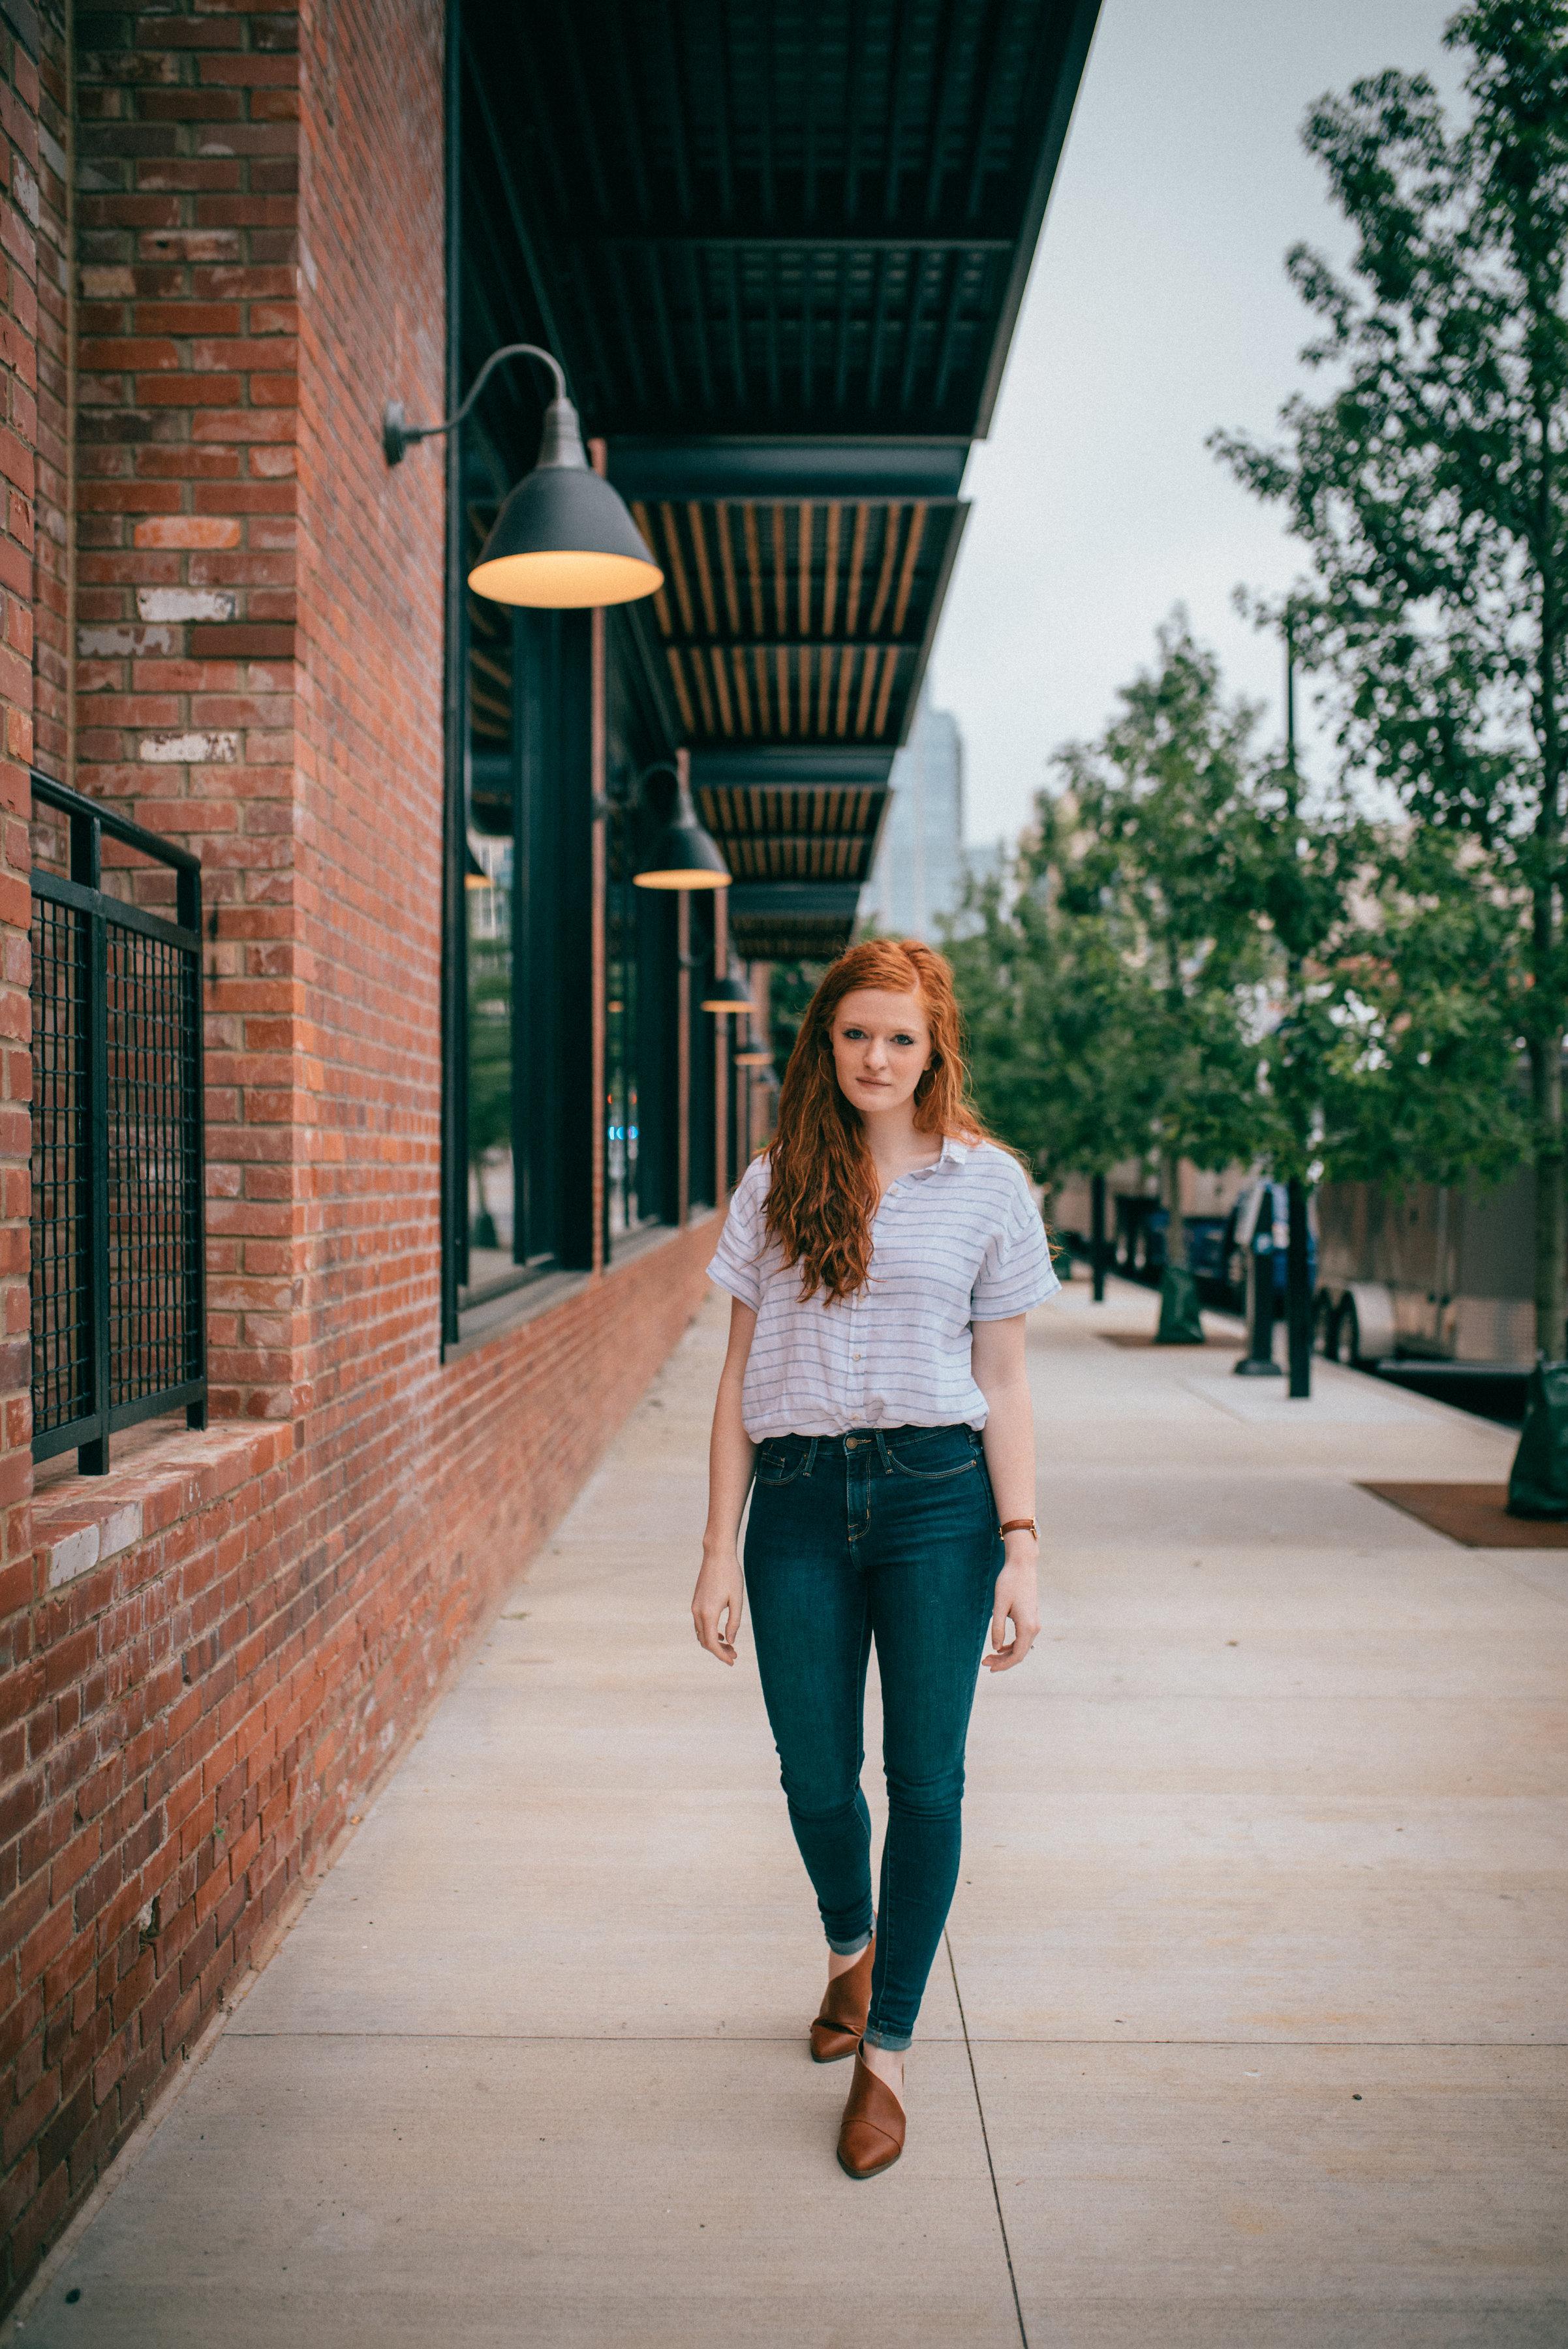 Raleigh Lifestyle Blogger - Raleigh Creative Community - Lifestyle Blogger -  Outfit of the Day - Outfit Inspiration - Universal Threads